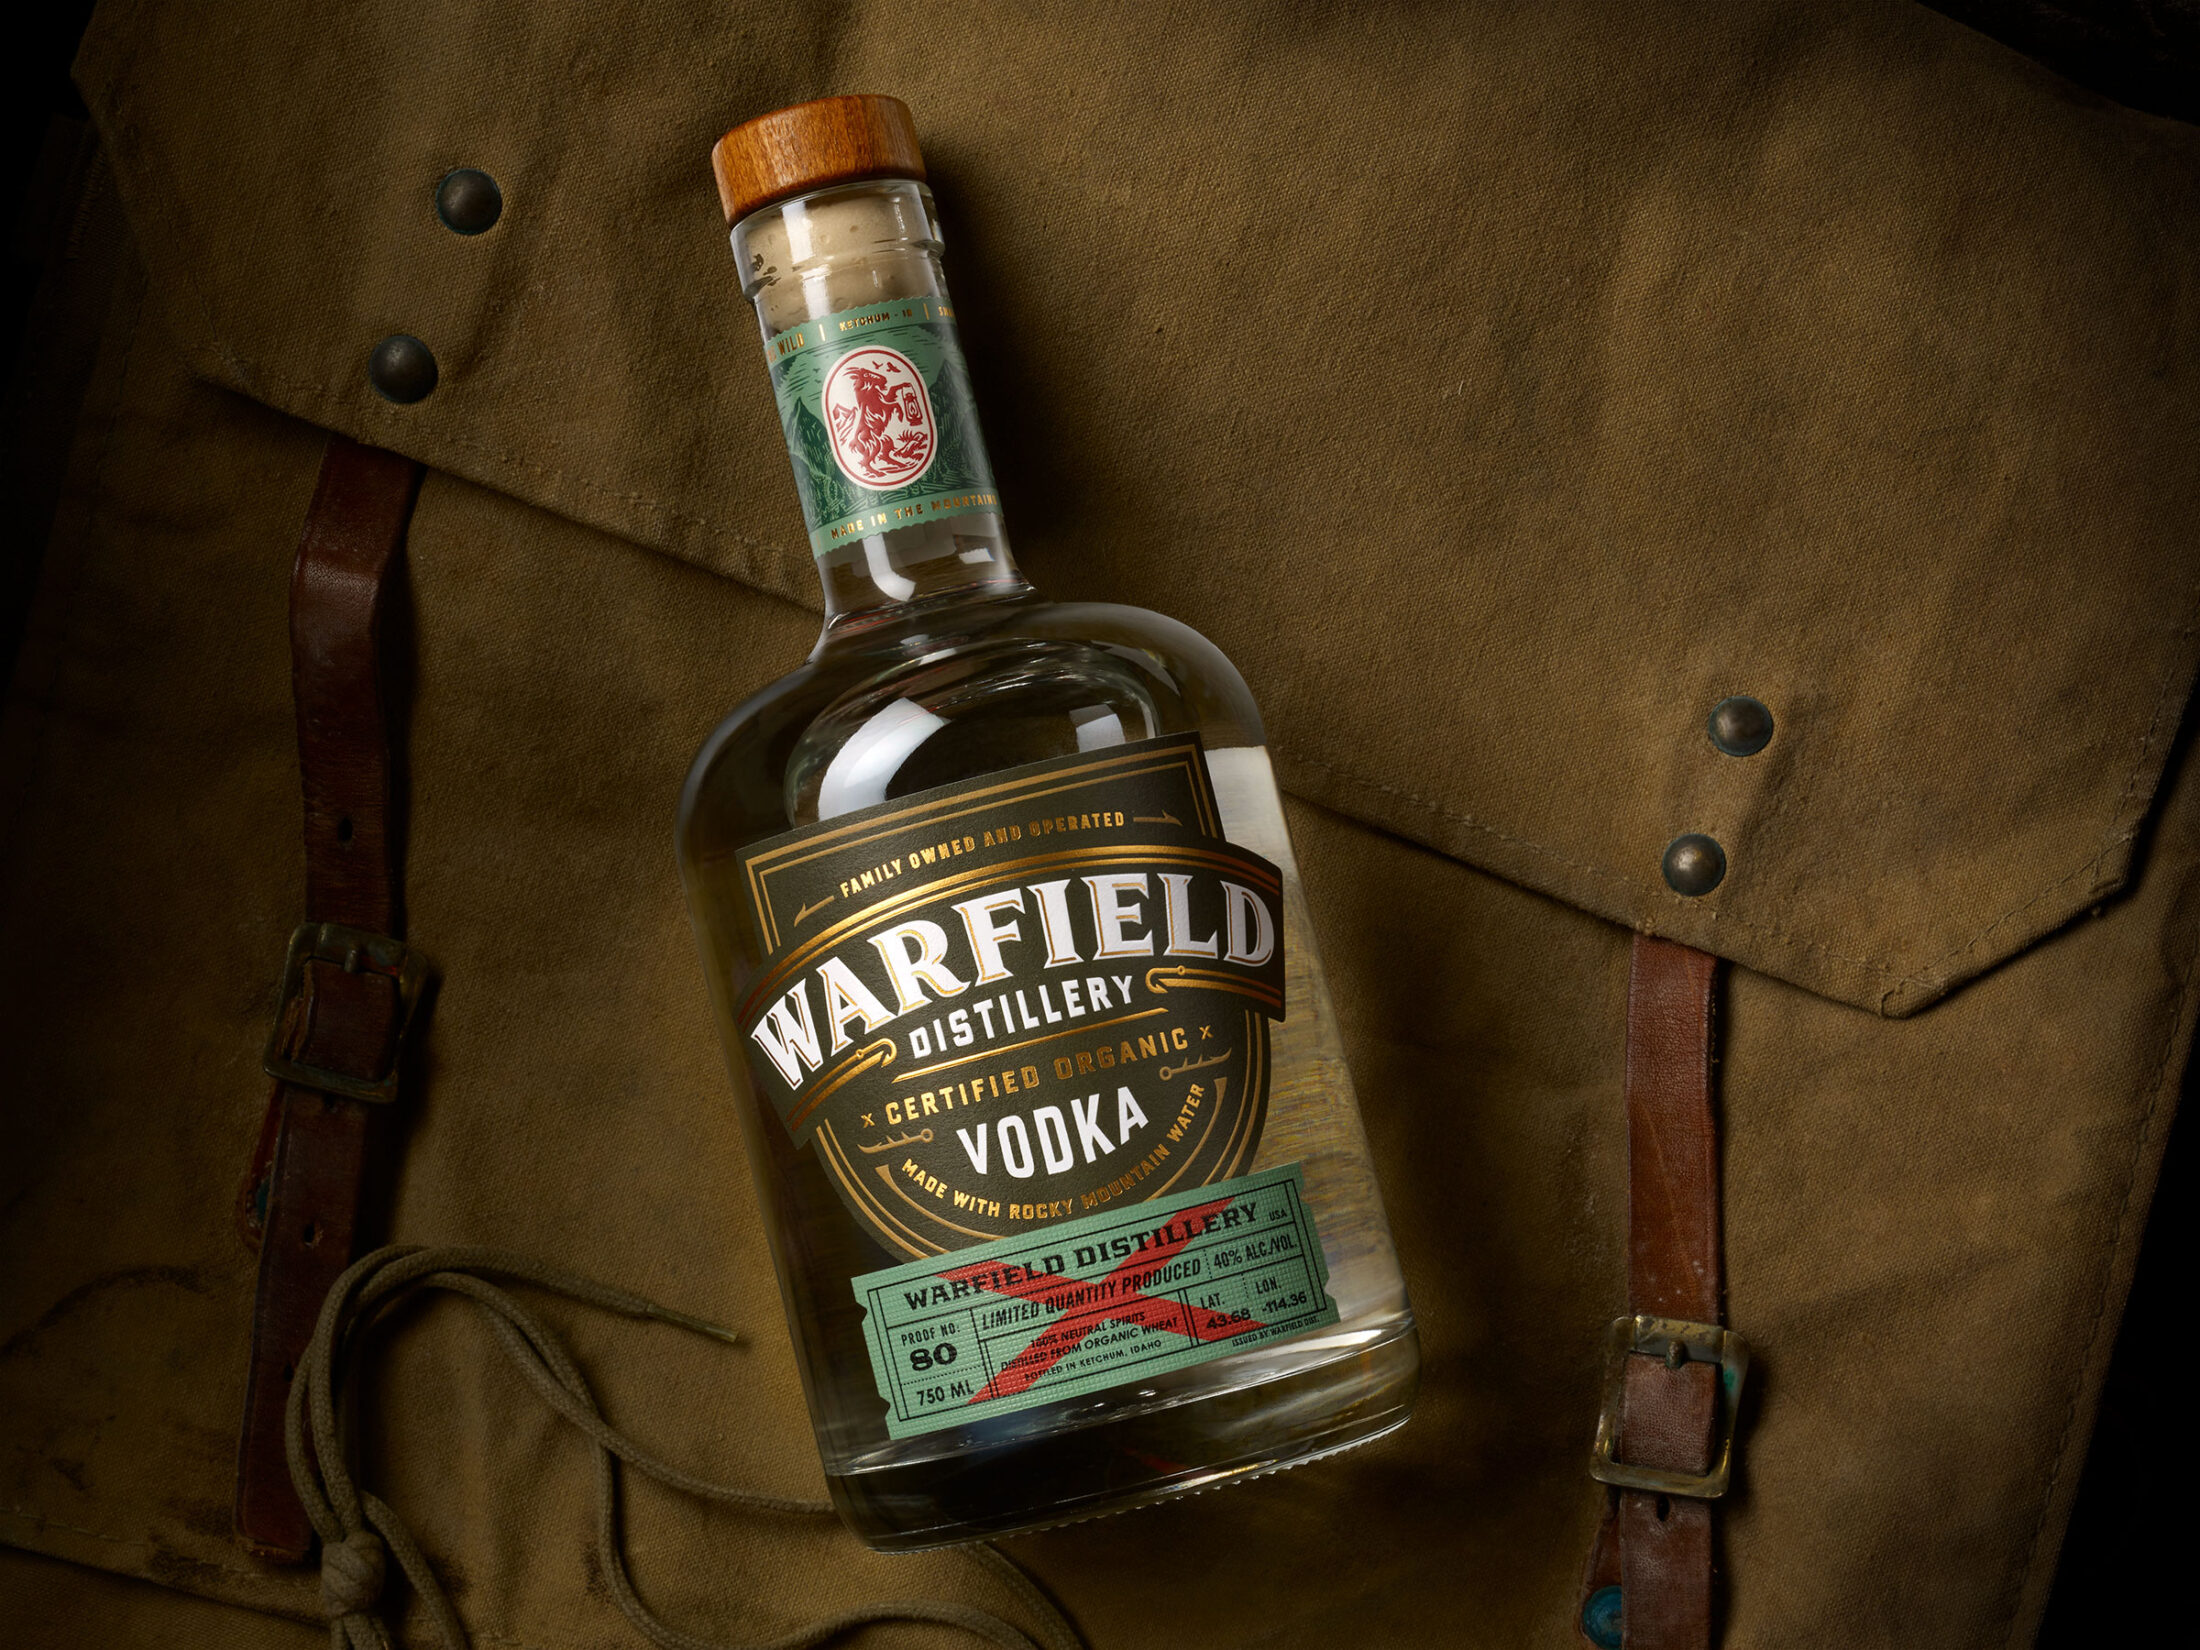 Warfield Vodka - Chad Michael Studio